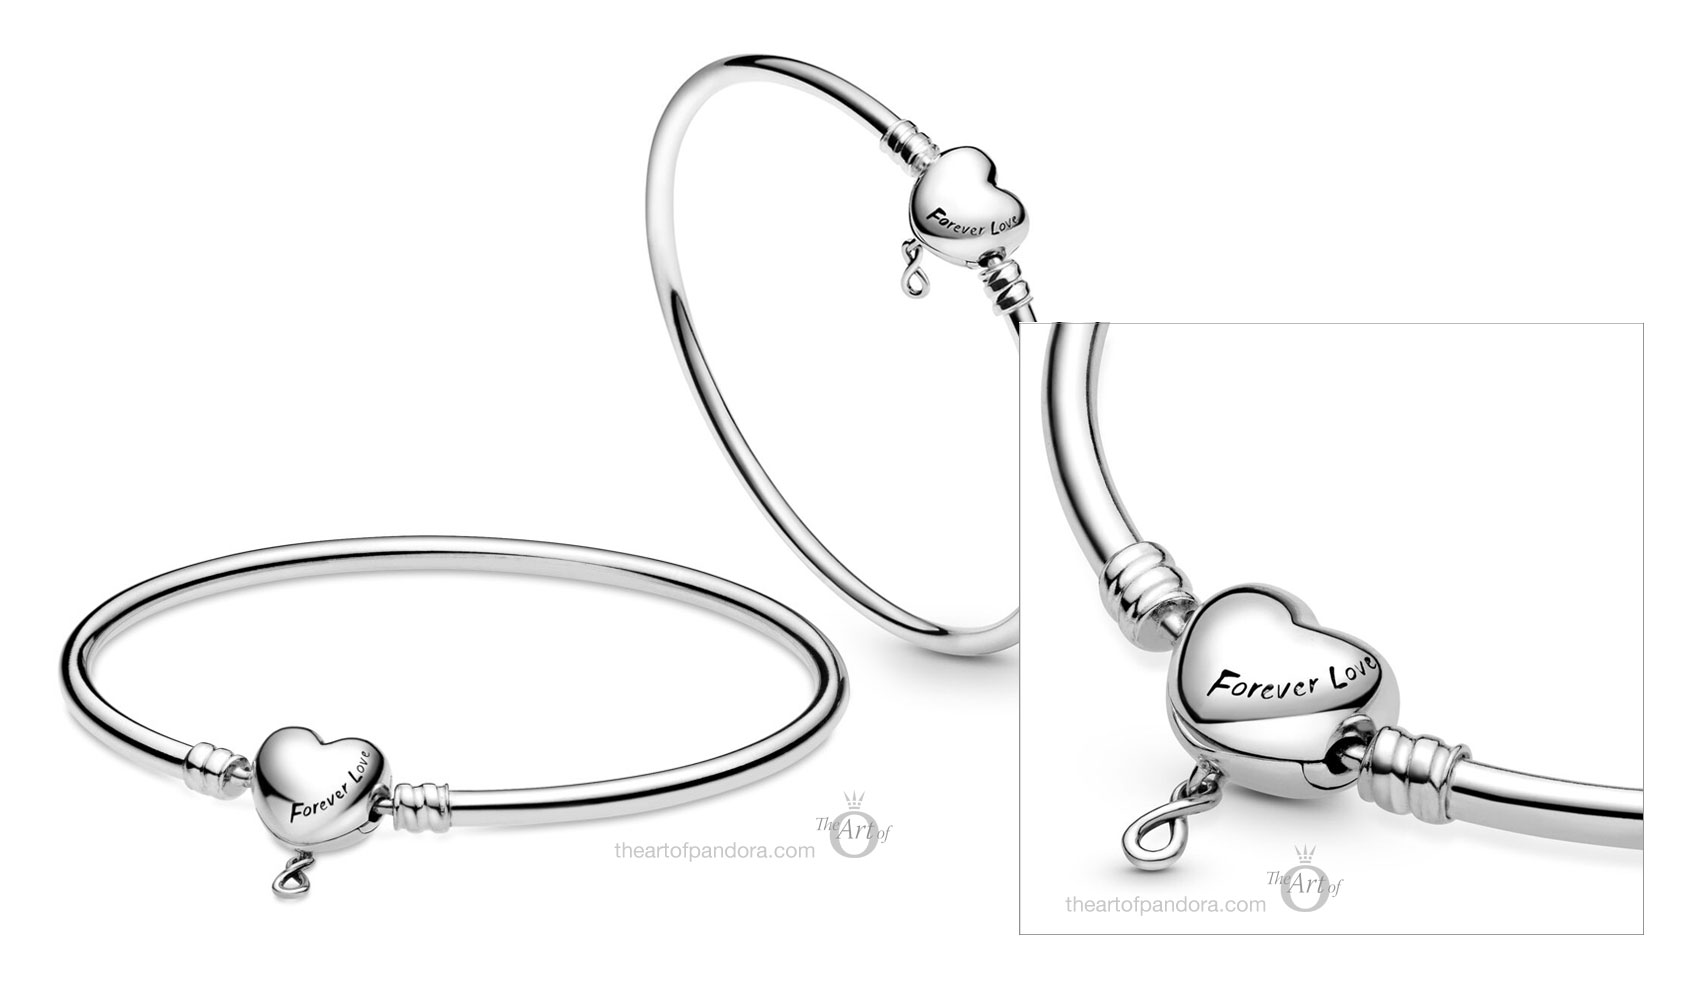 598891C00-Pandora-pandora-moments-infinity-heart-clasp-bangle ...